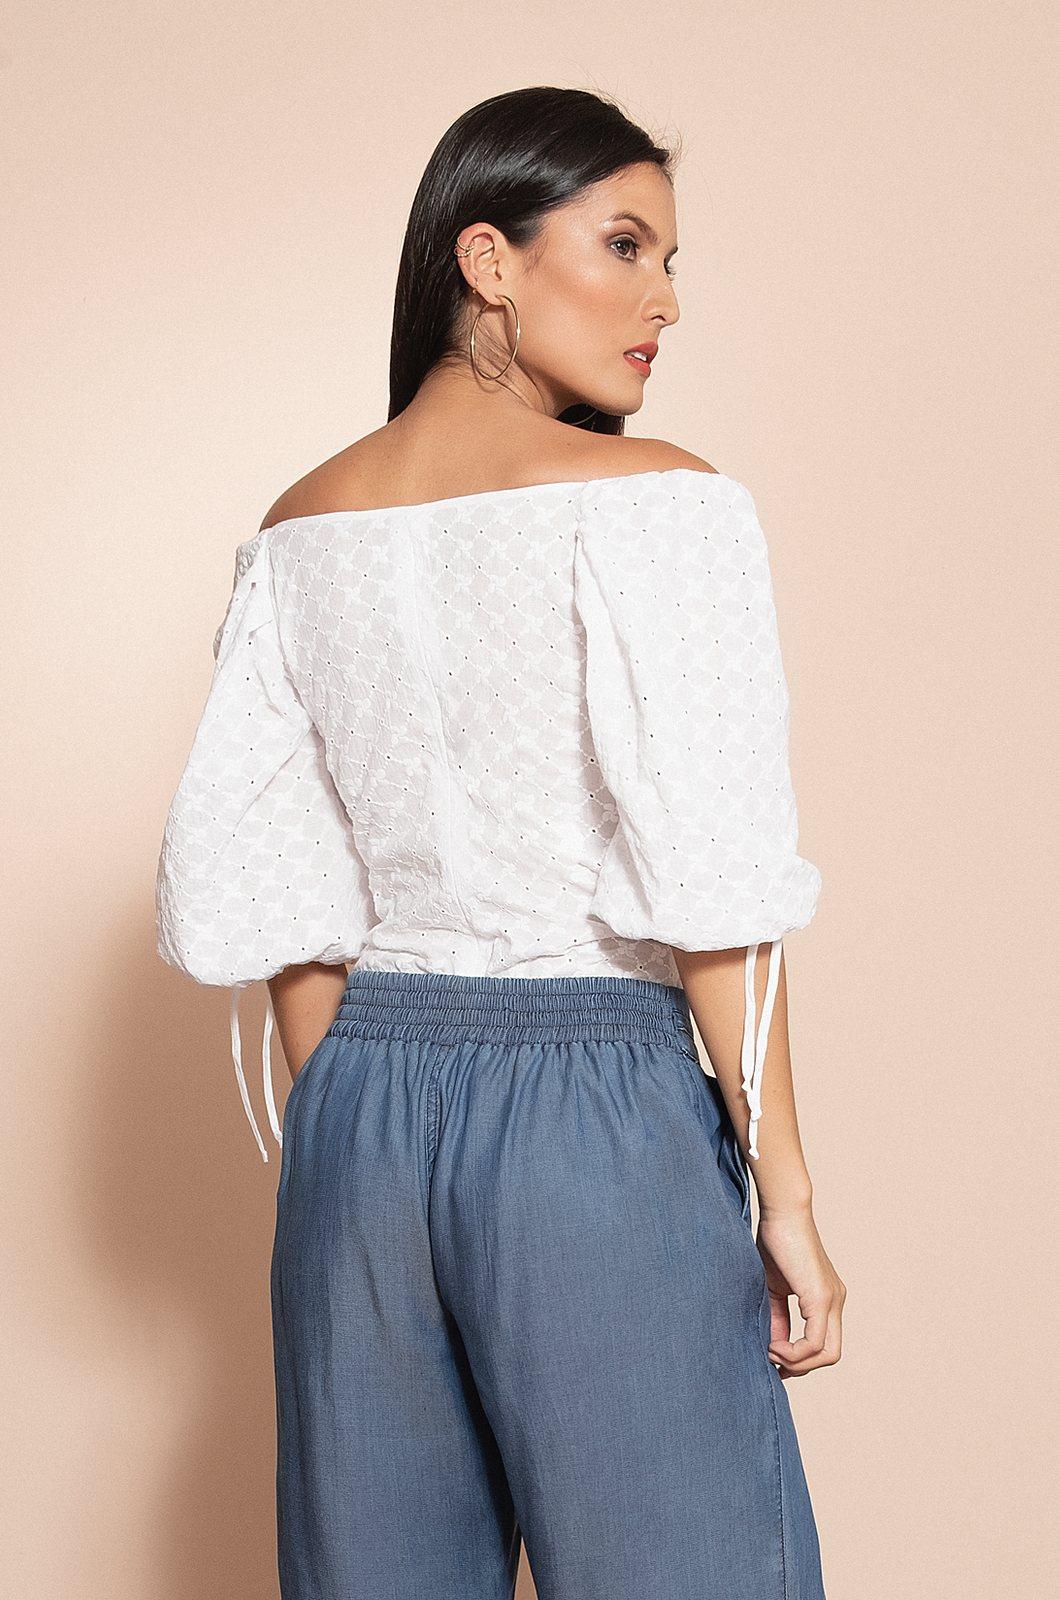 Blusa manga ancha en hoja rota - Chazari 4995-20